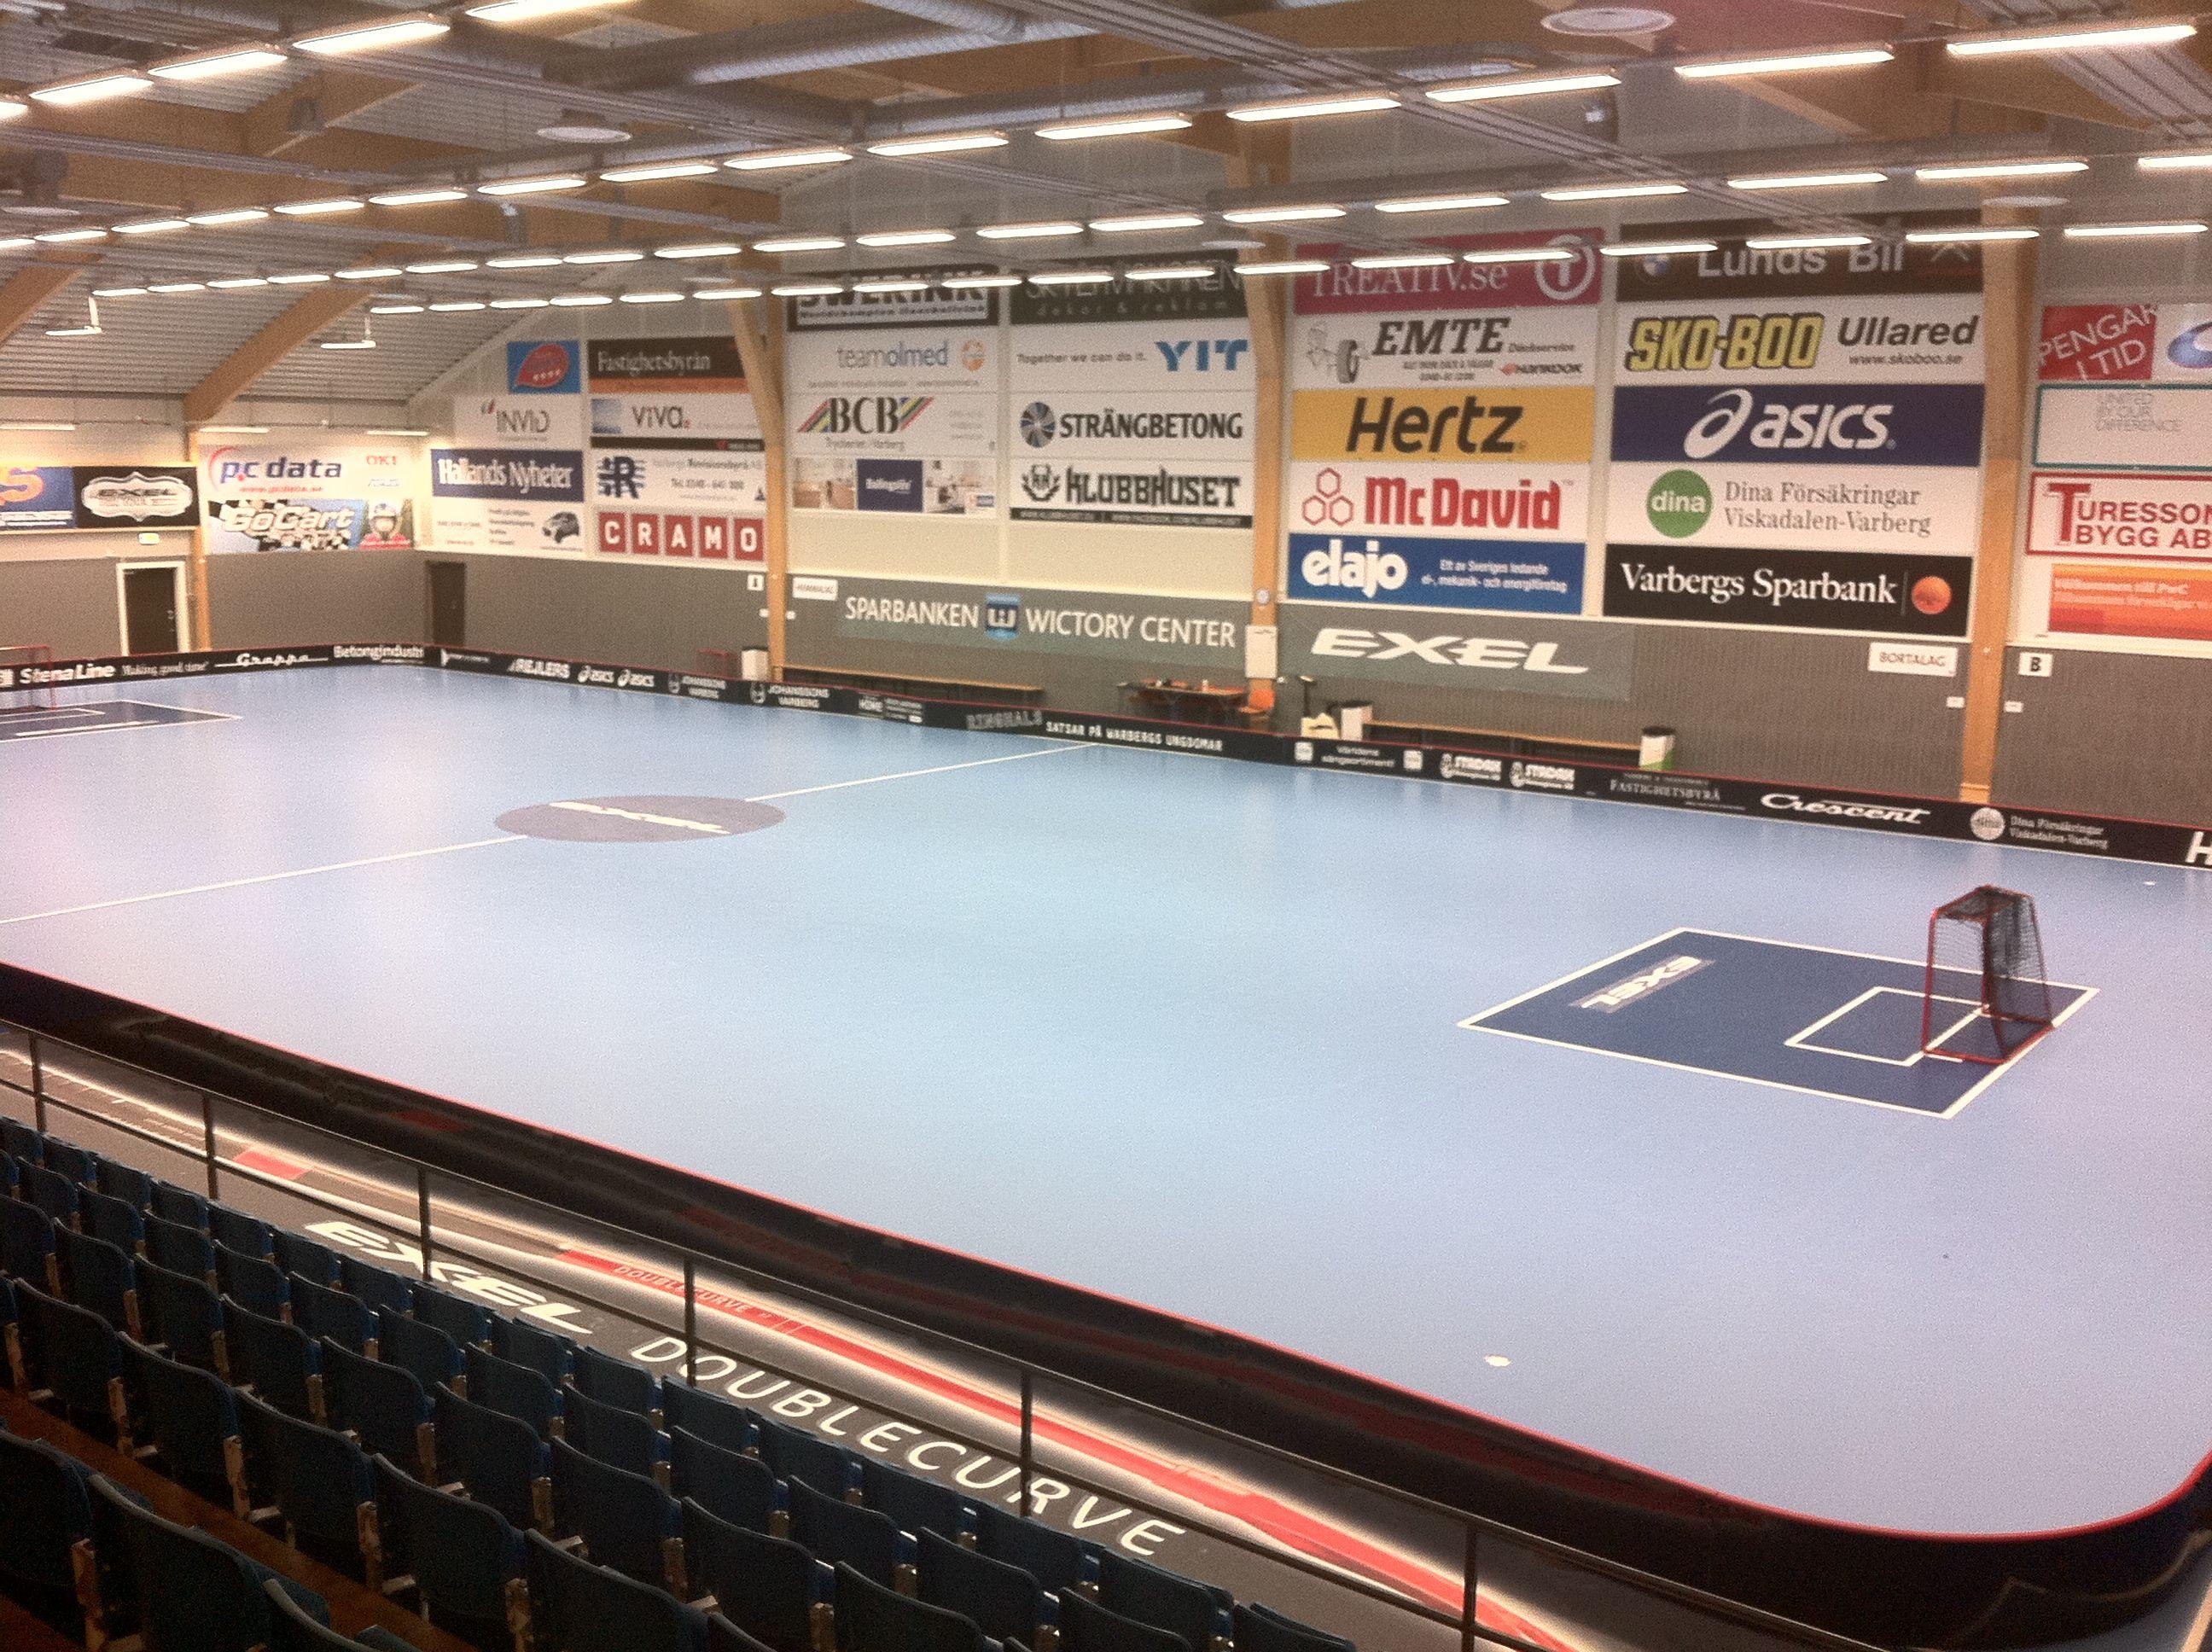 Sparbanken Wictory Center Exelplanen Sportsplex Facility My Dream